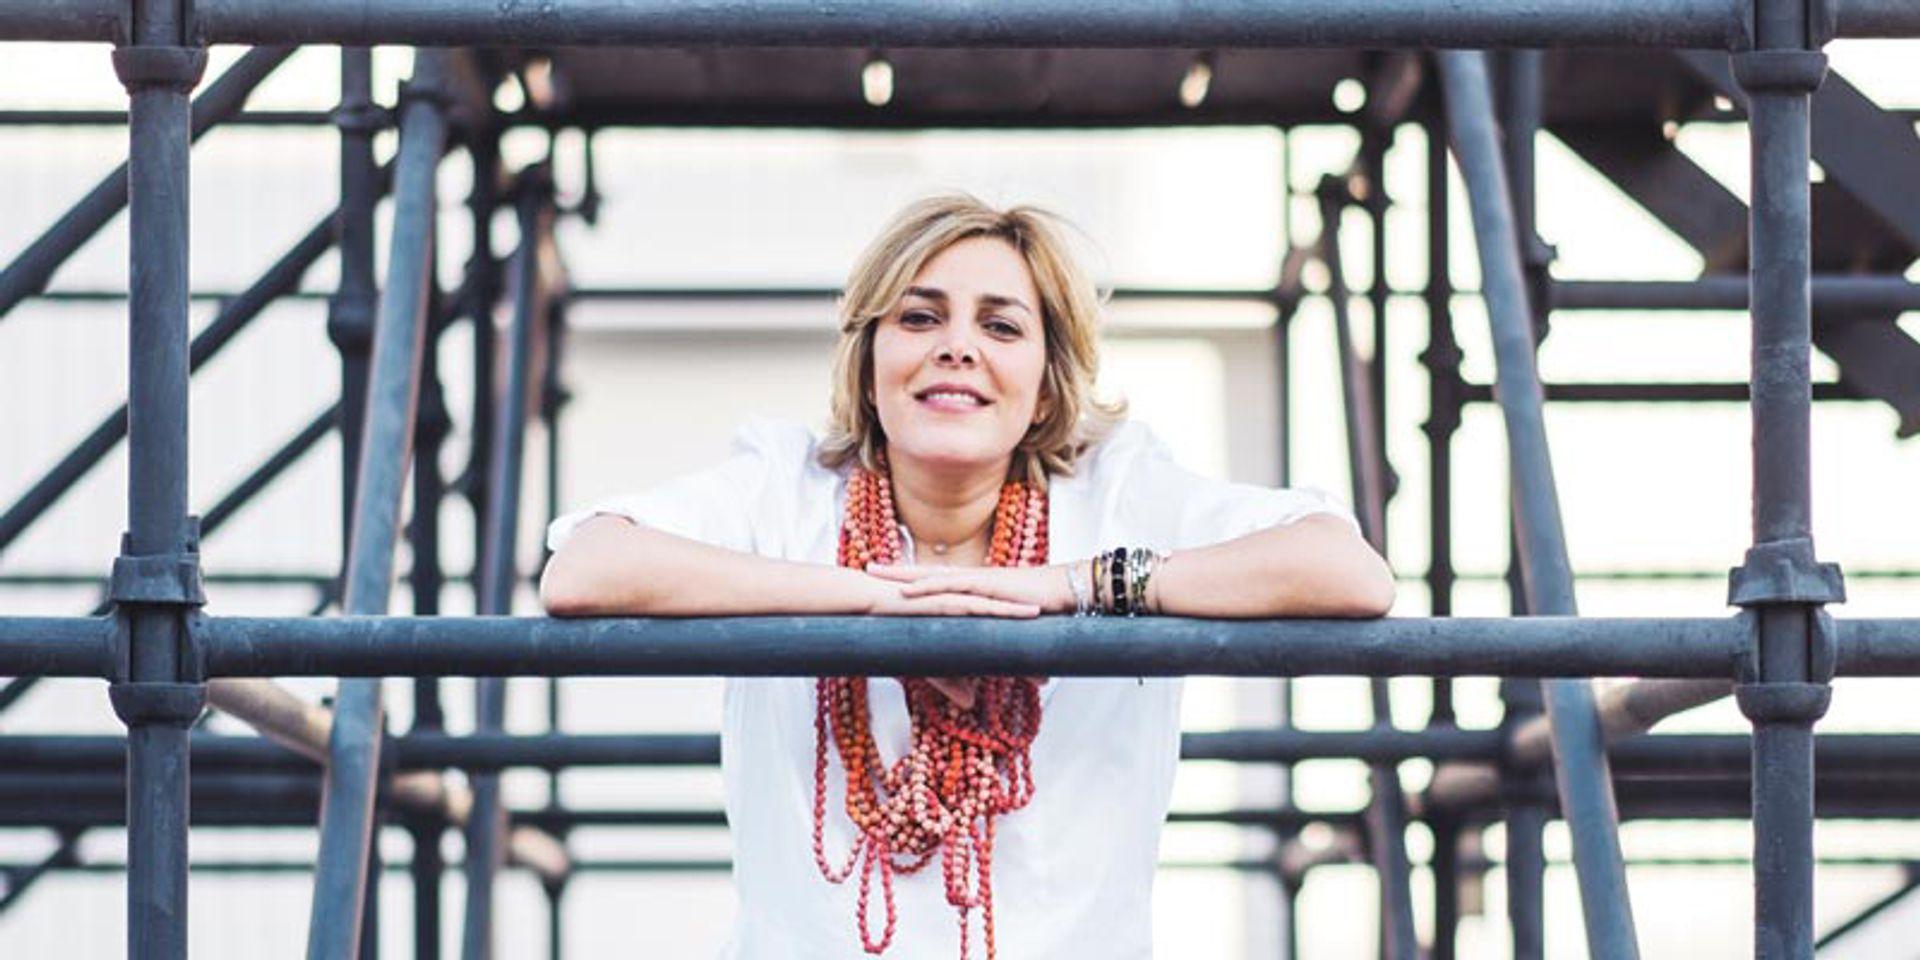 Myrna Ayad departs after two years as director of Art Dubai Art Dubai